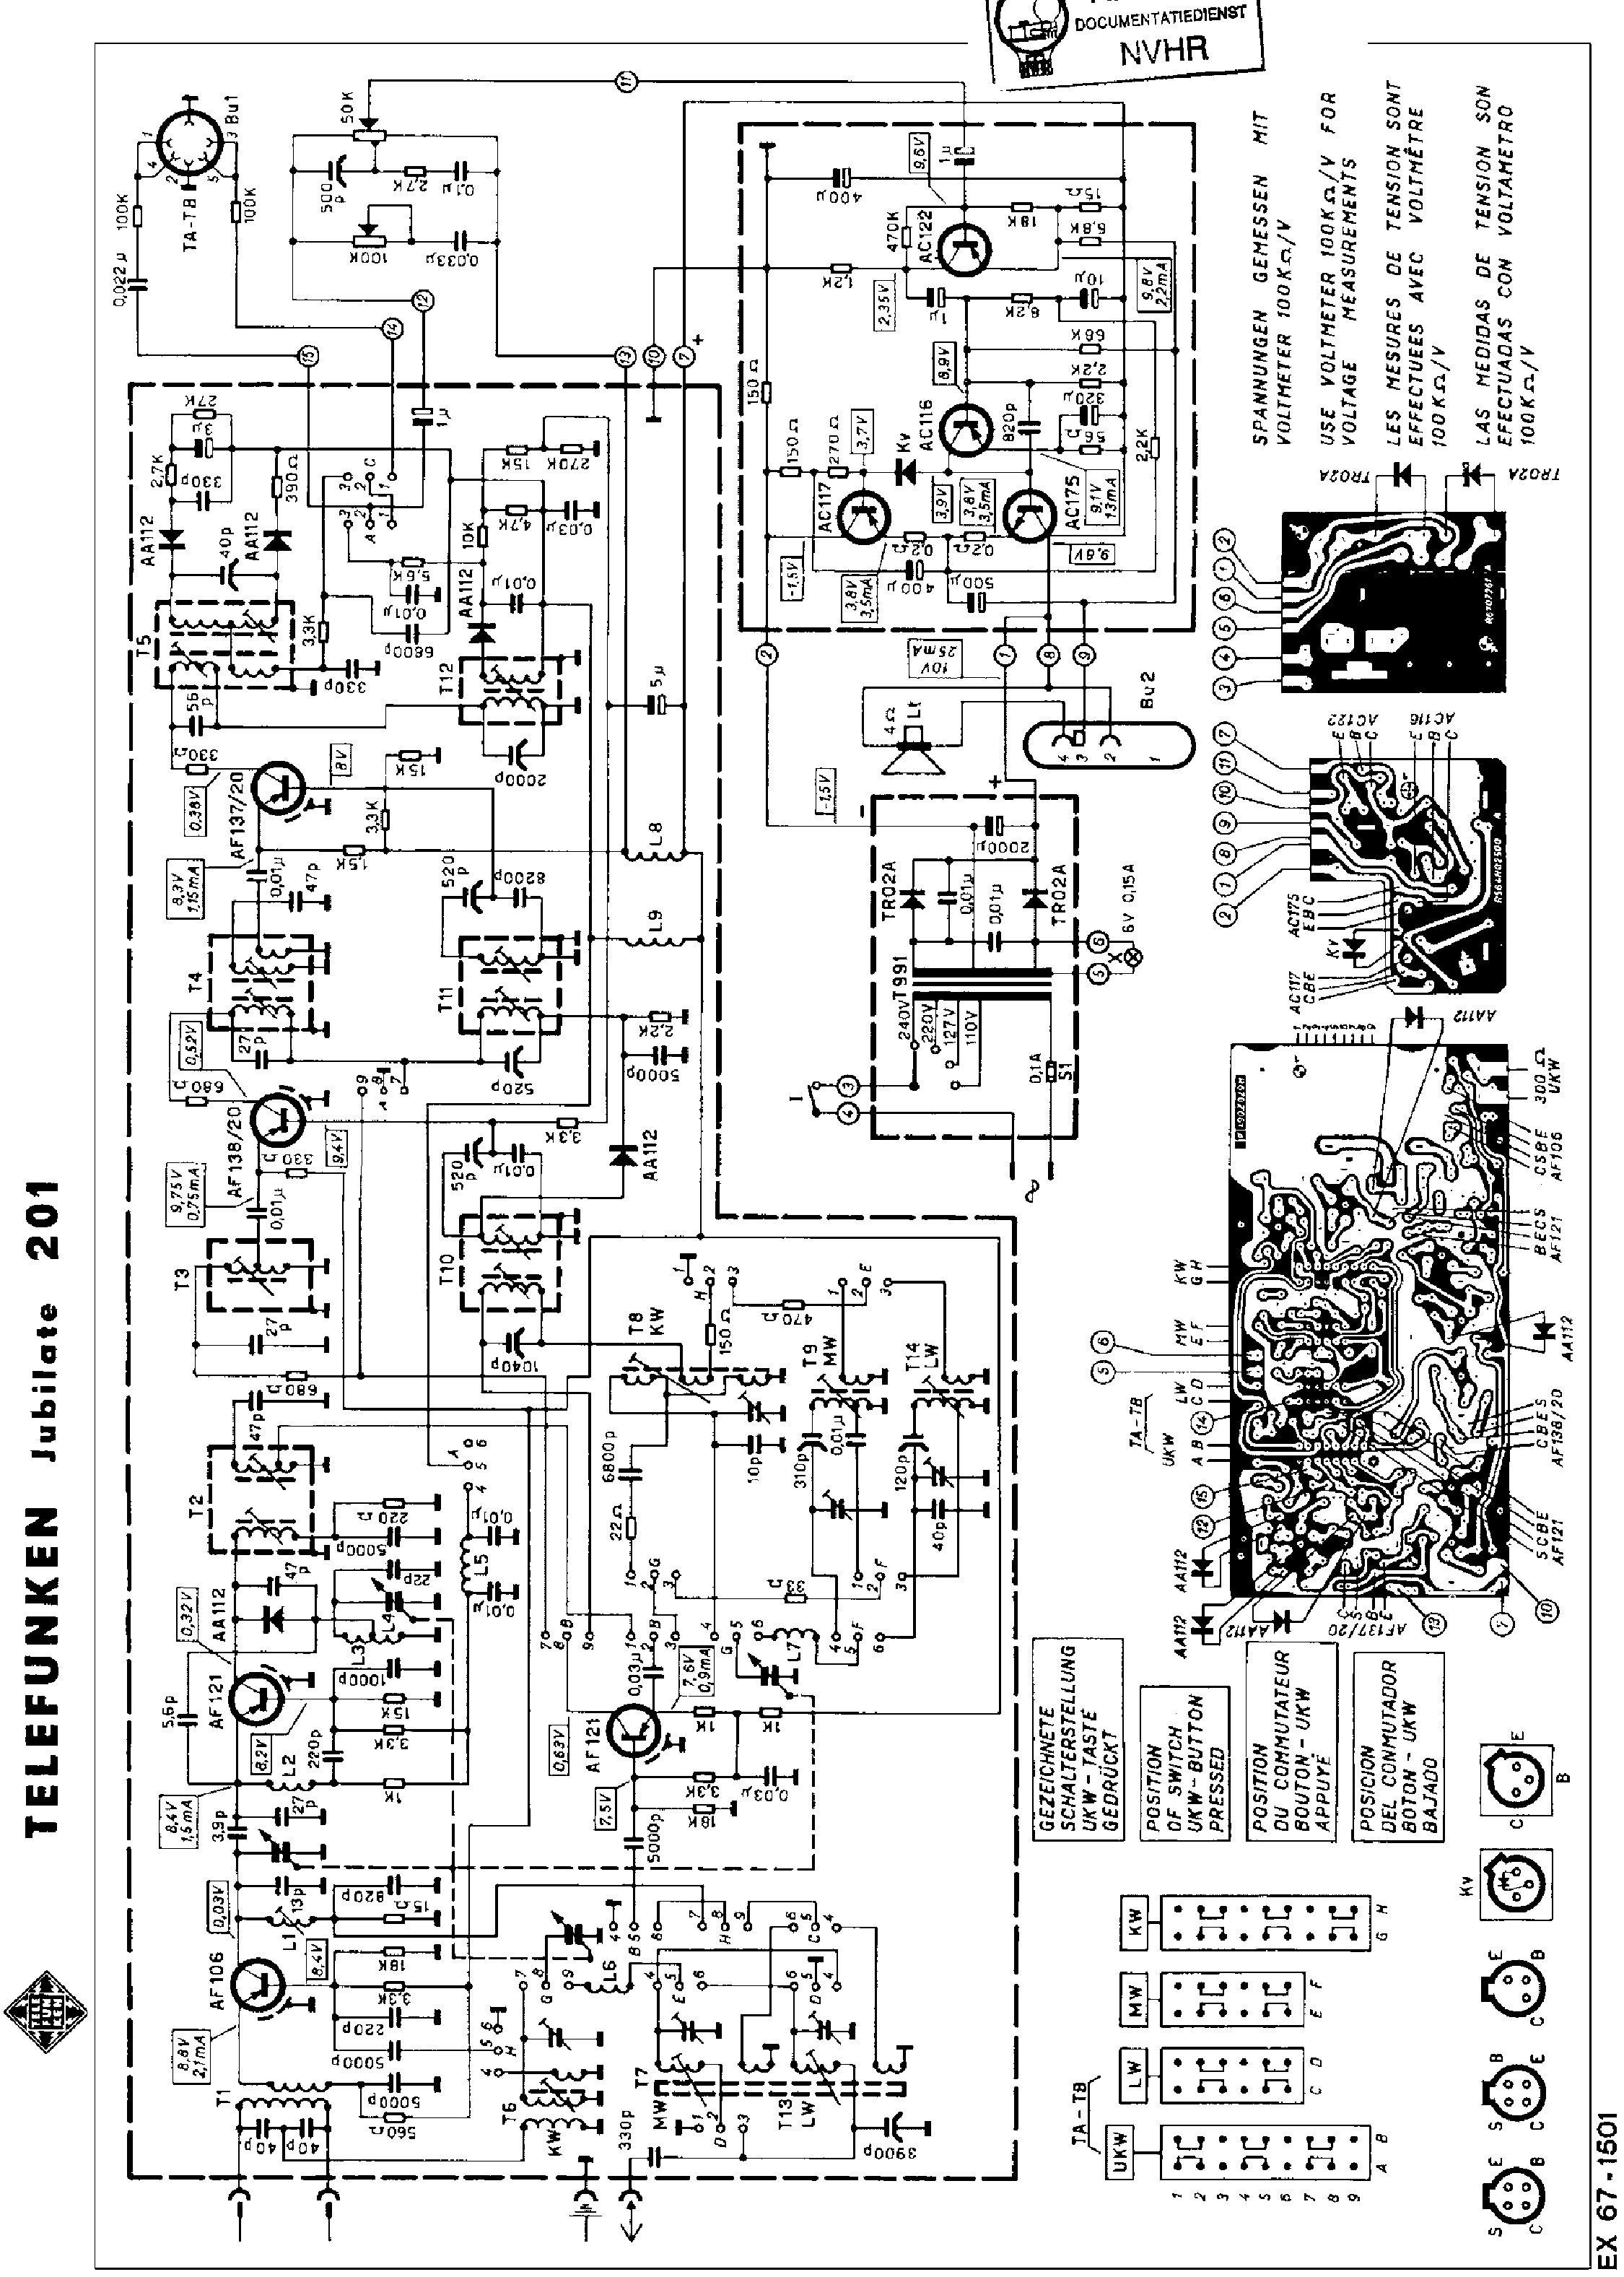 Telefunken Ht870 Schematics Service Manual Free Download